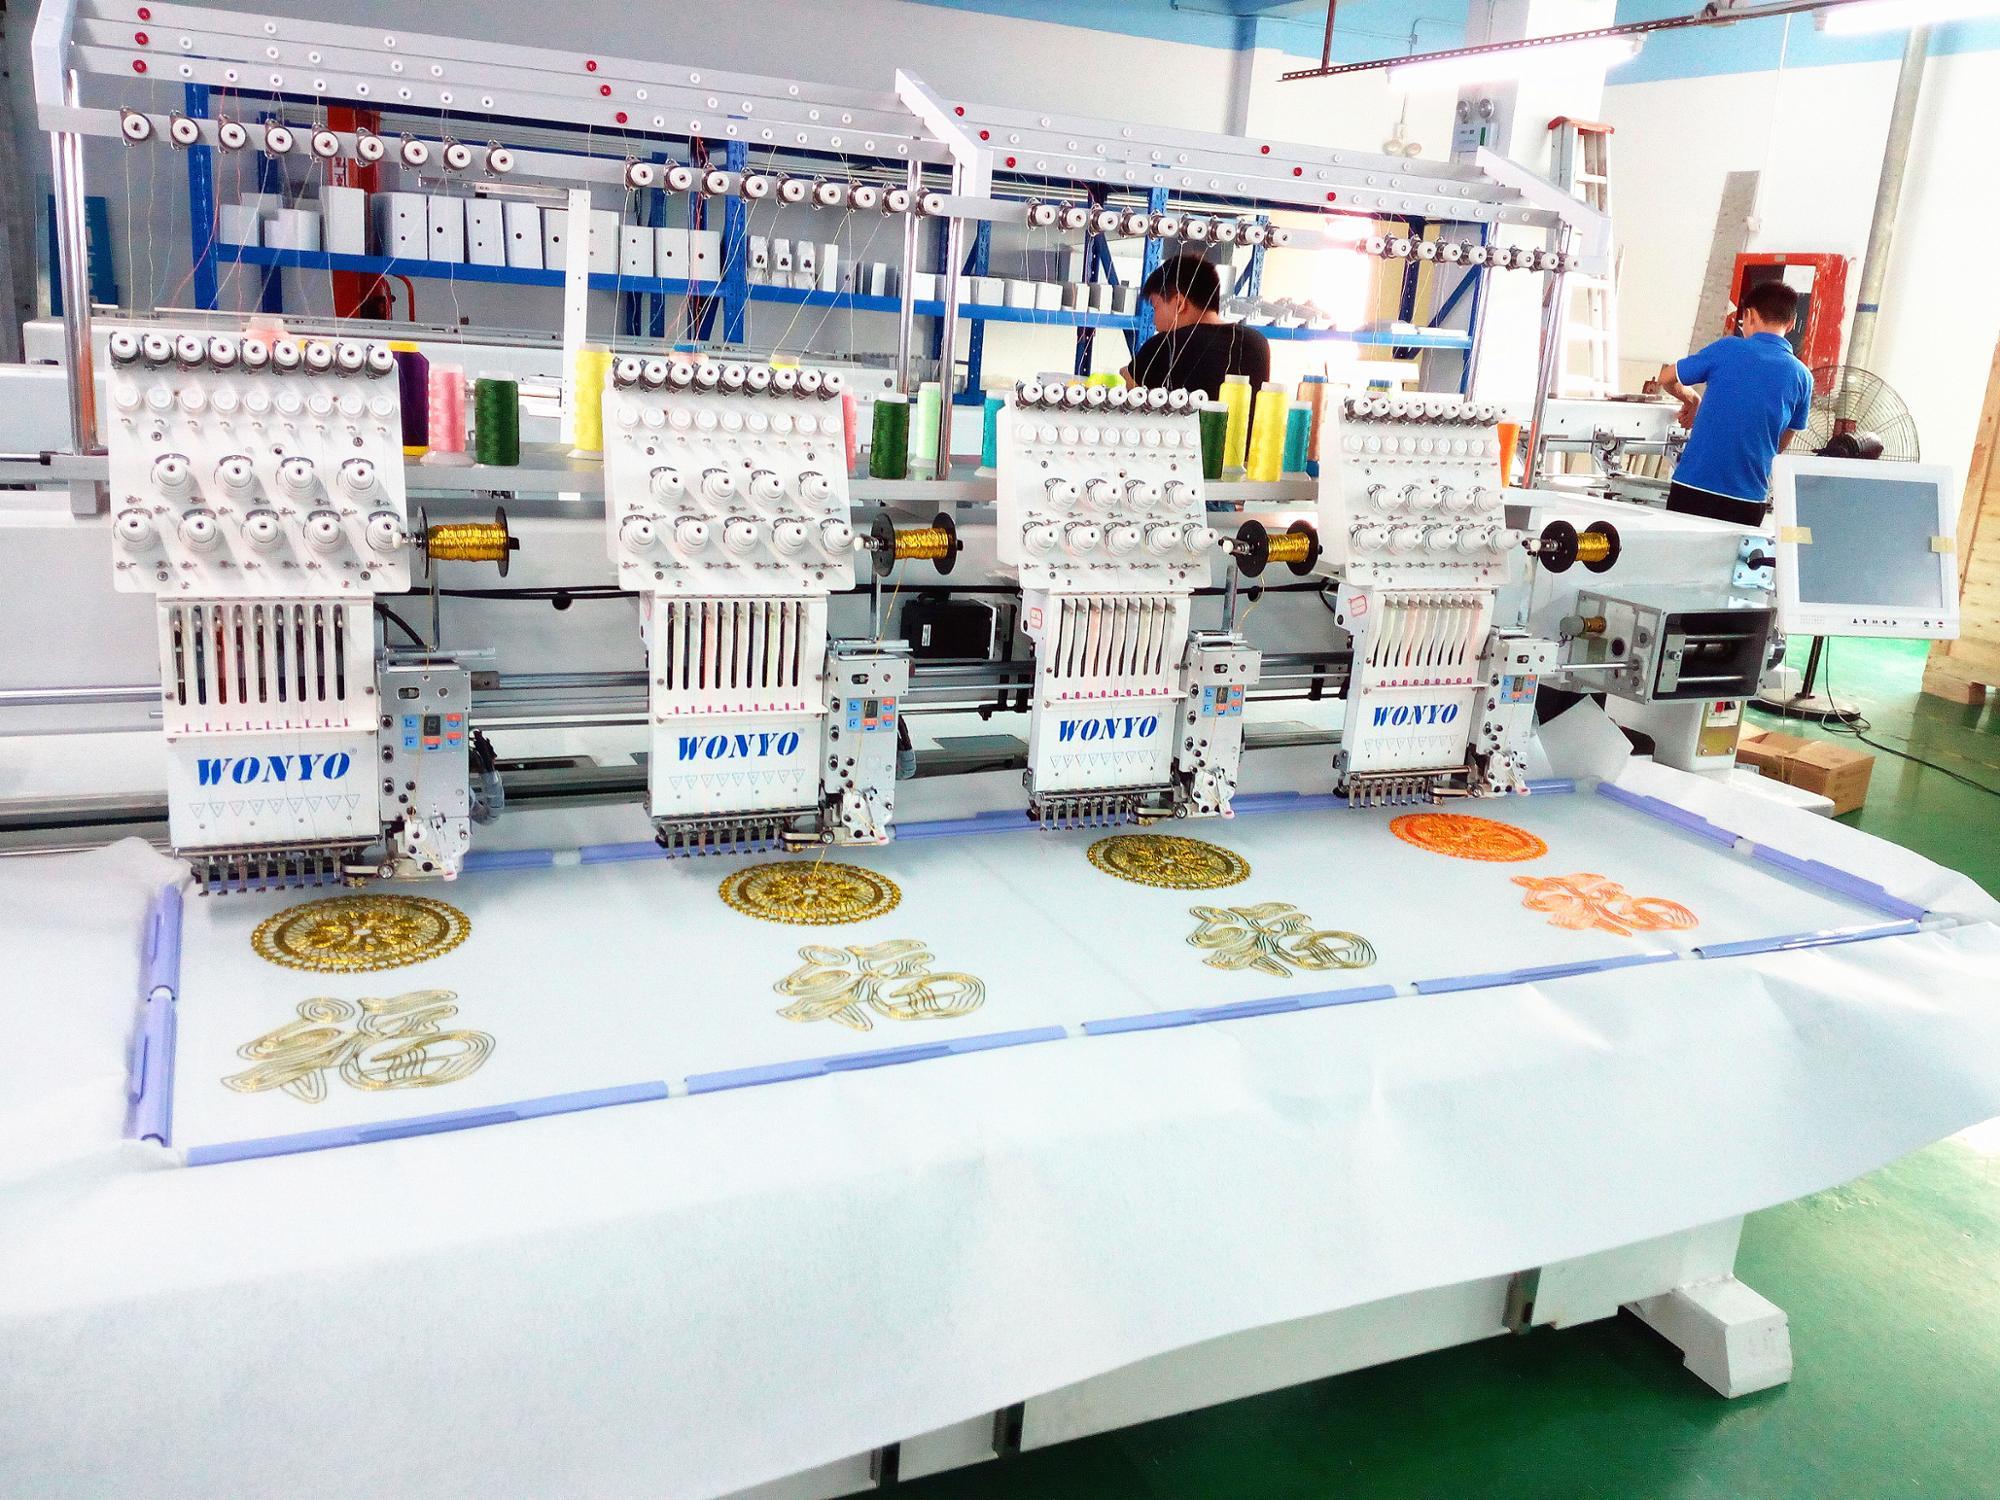 WONYO High speed 4 heads embroidery machine